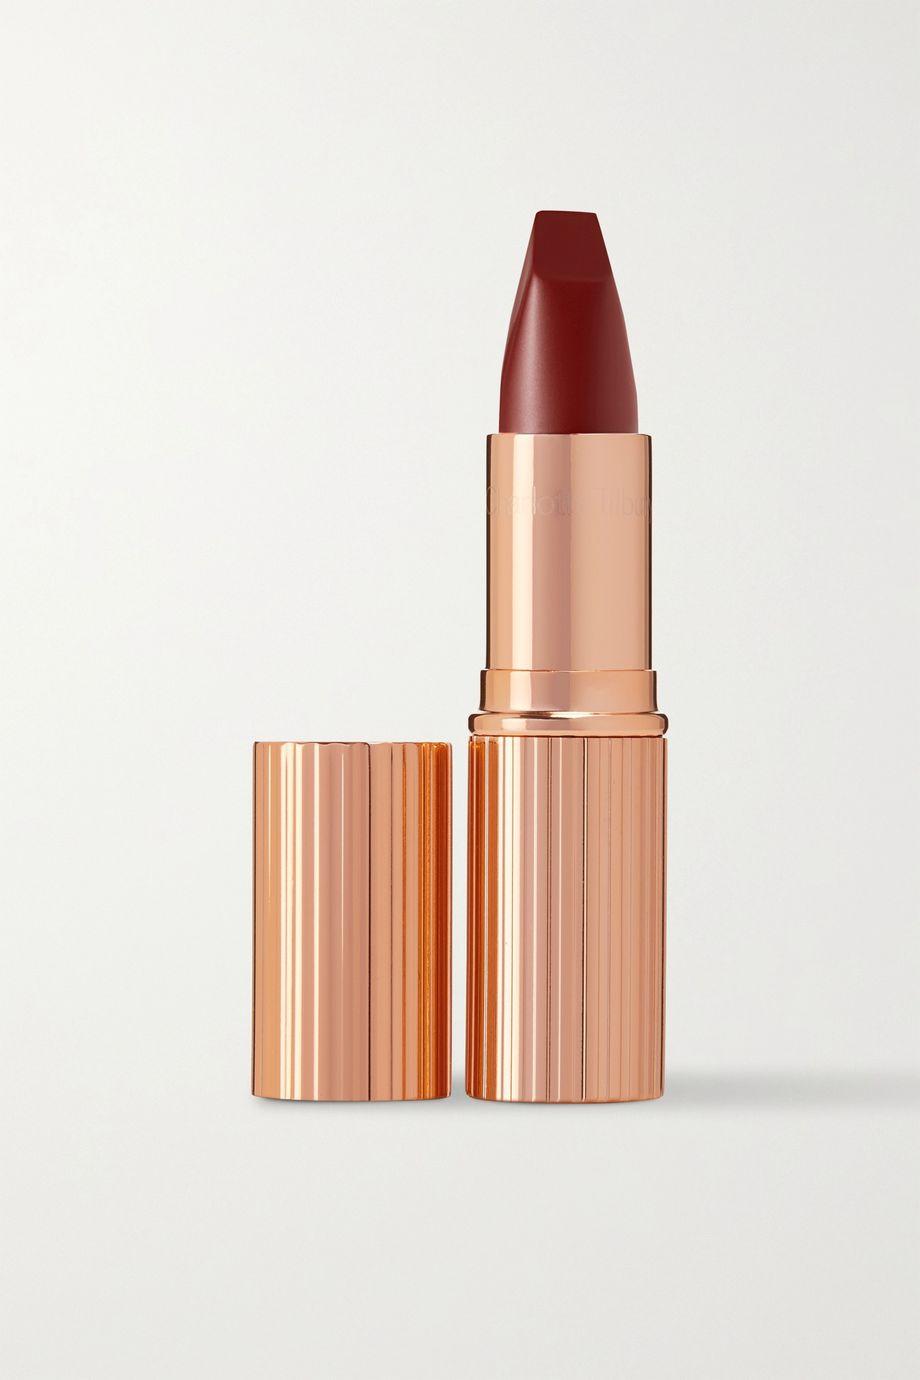 Charlotte Tilbury Matte Revolution Lipstick - Walk Of Shame